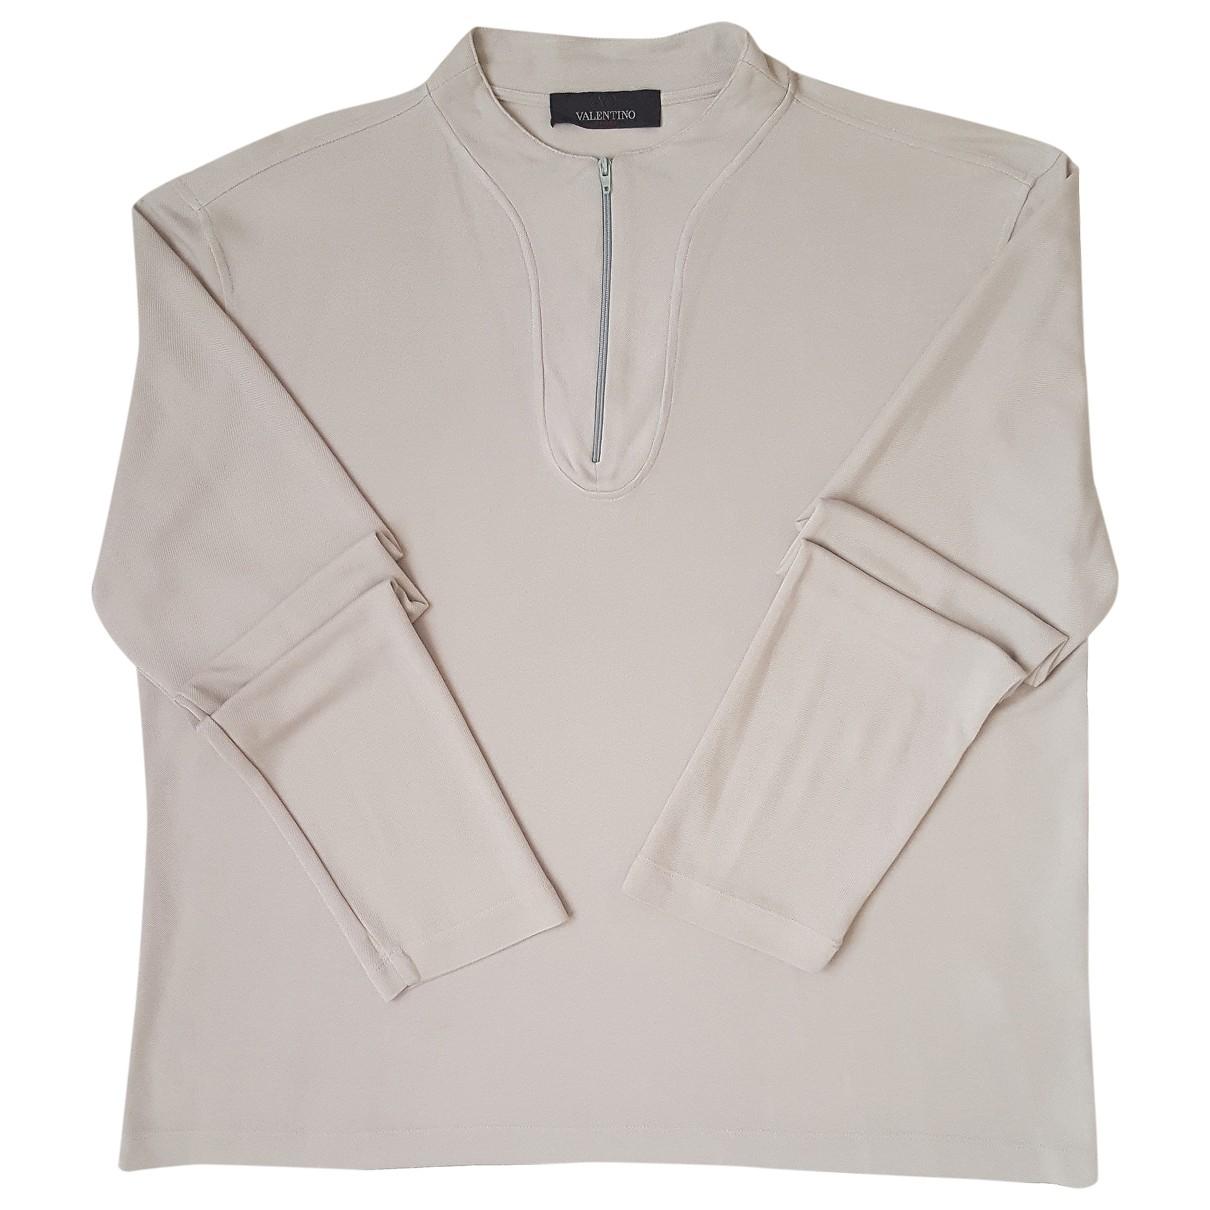 Valentino Garavani \N Grey Cotton Knitwear & Sweatshirts for Men L International